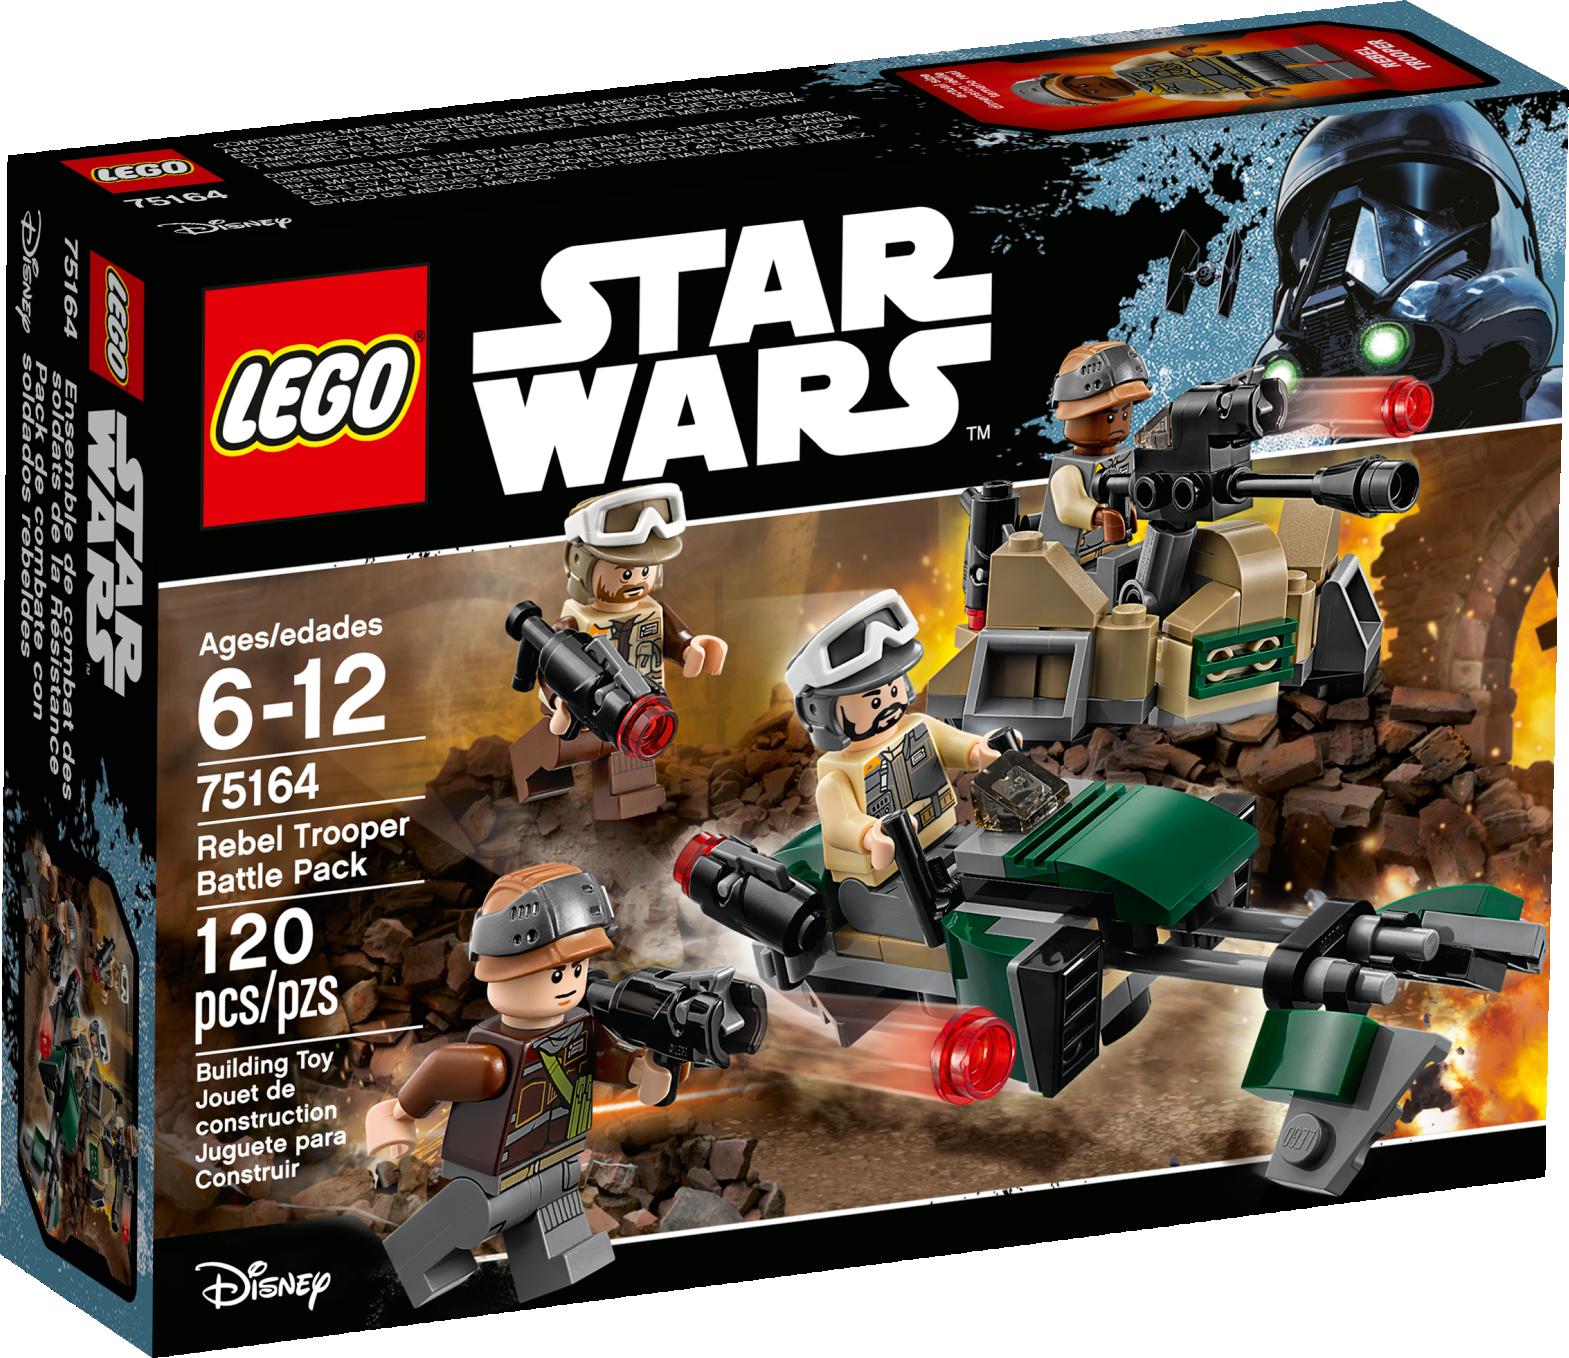 Rebel Trooper Battle Pack